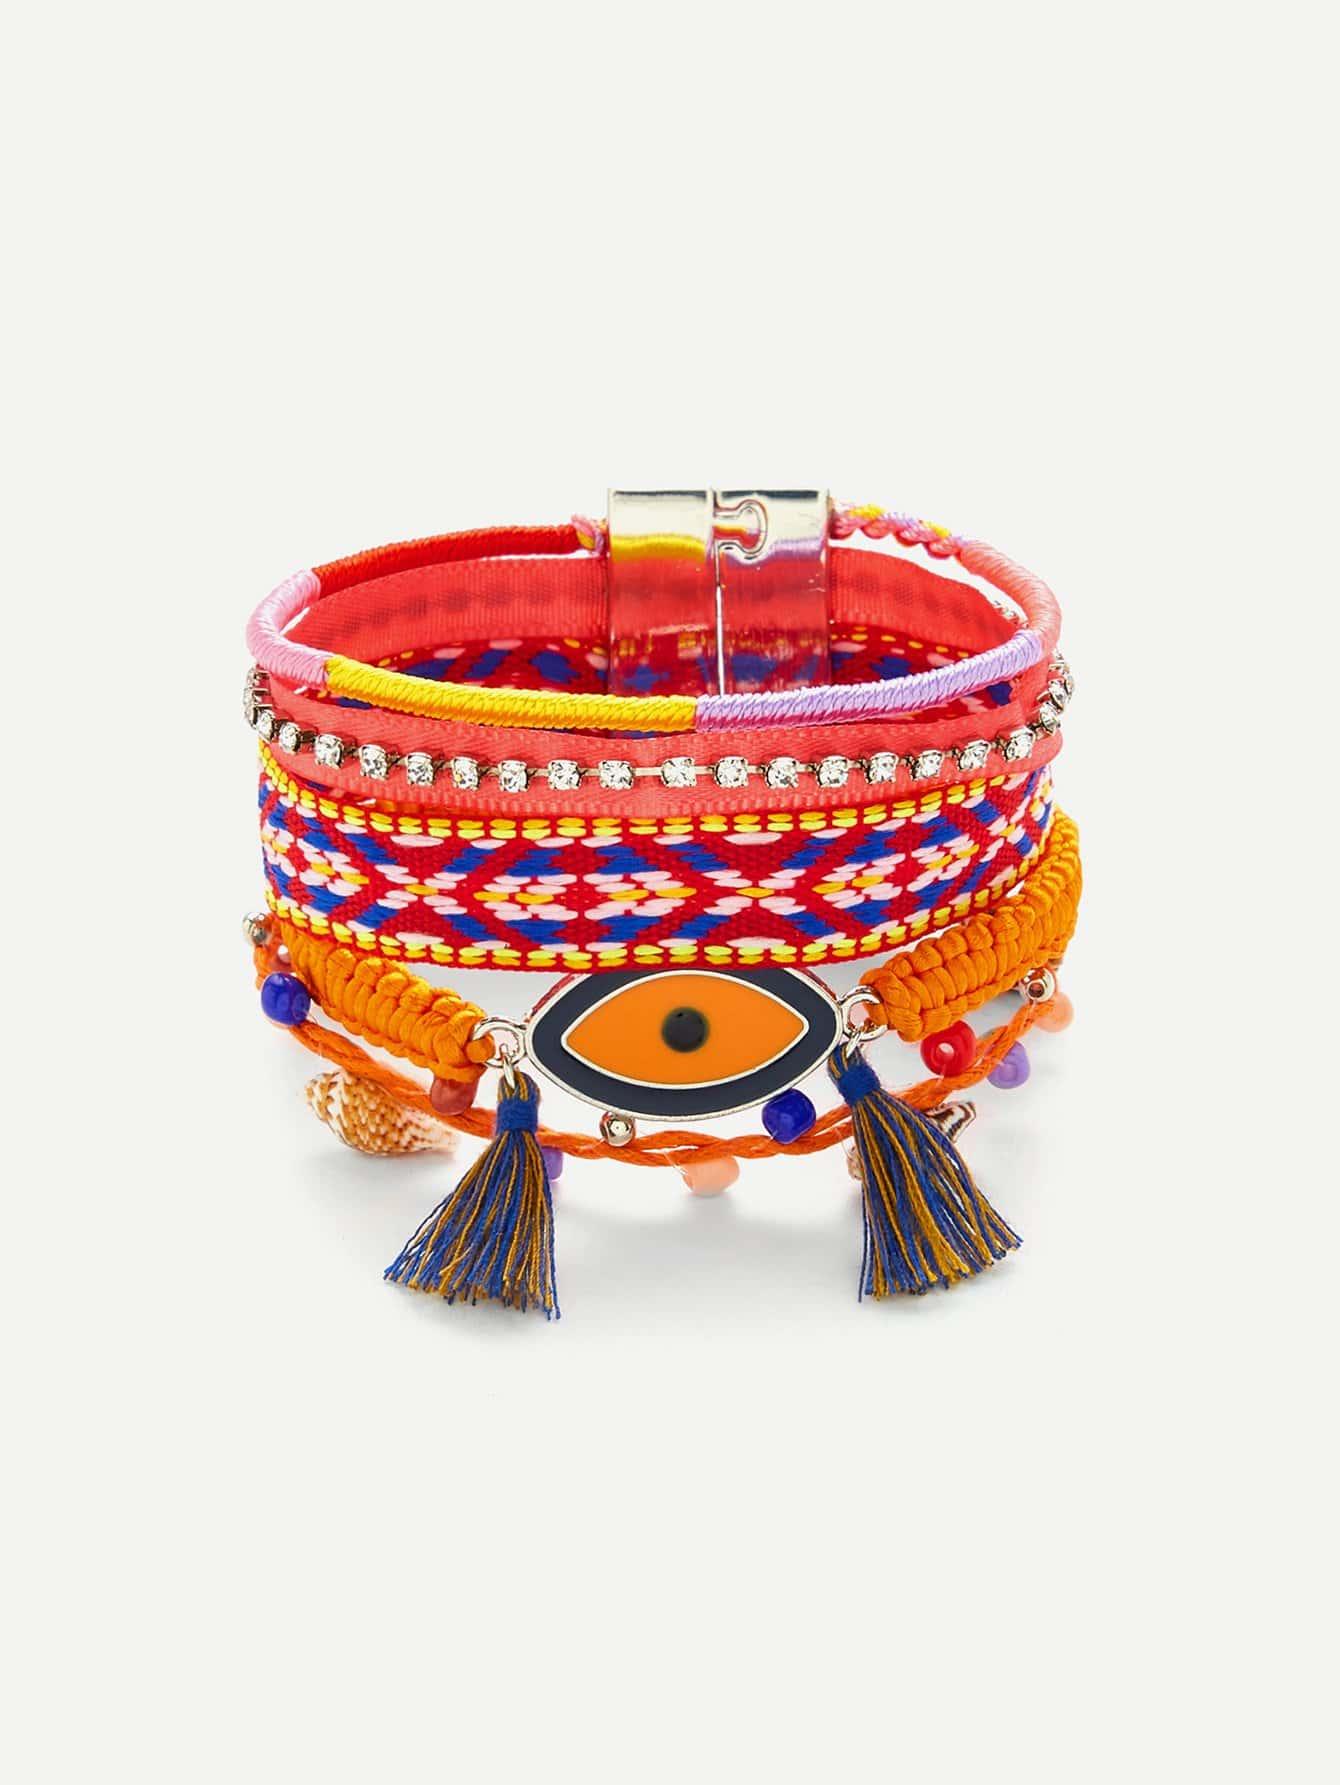 Layered Braided Bracelet shambhala one diamond rhinestone bead ball nylon braided bracelet